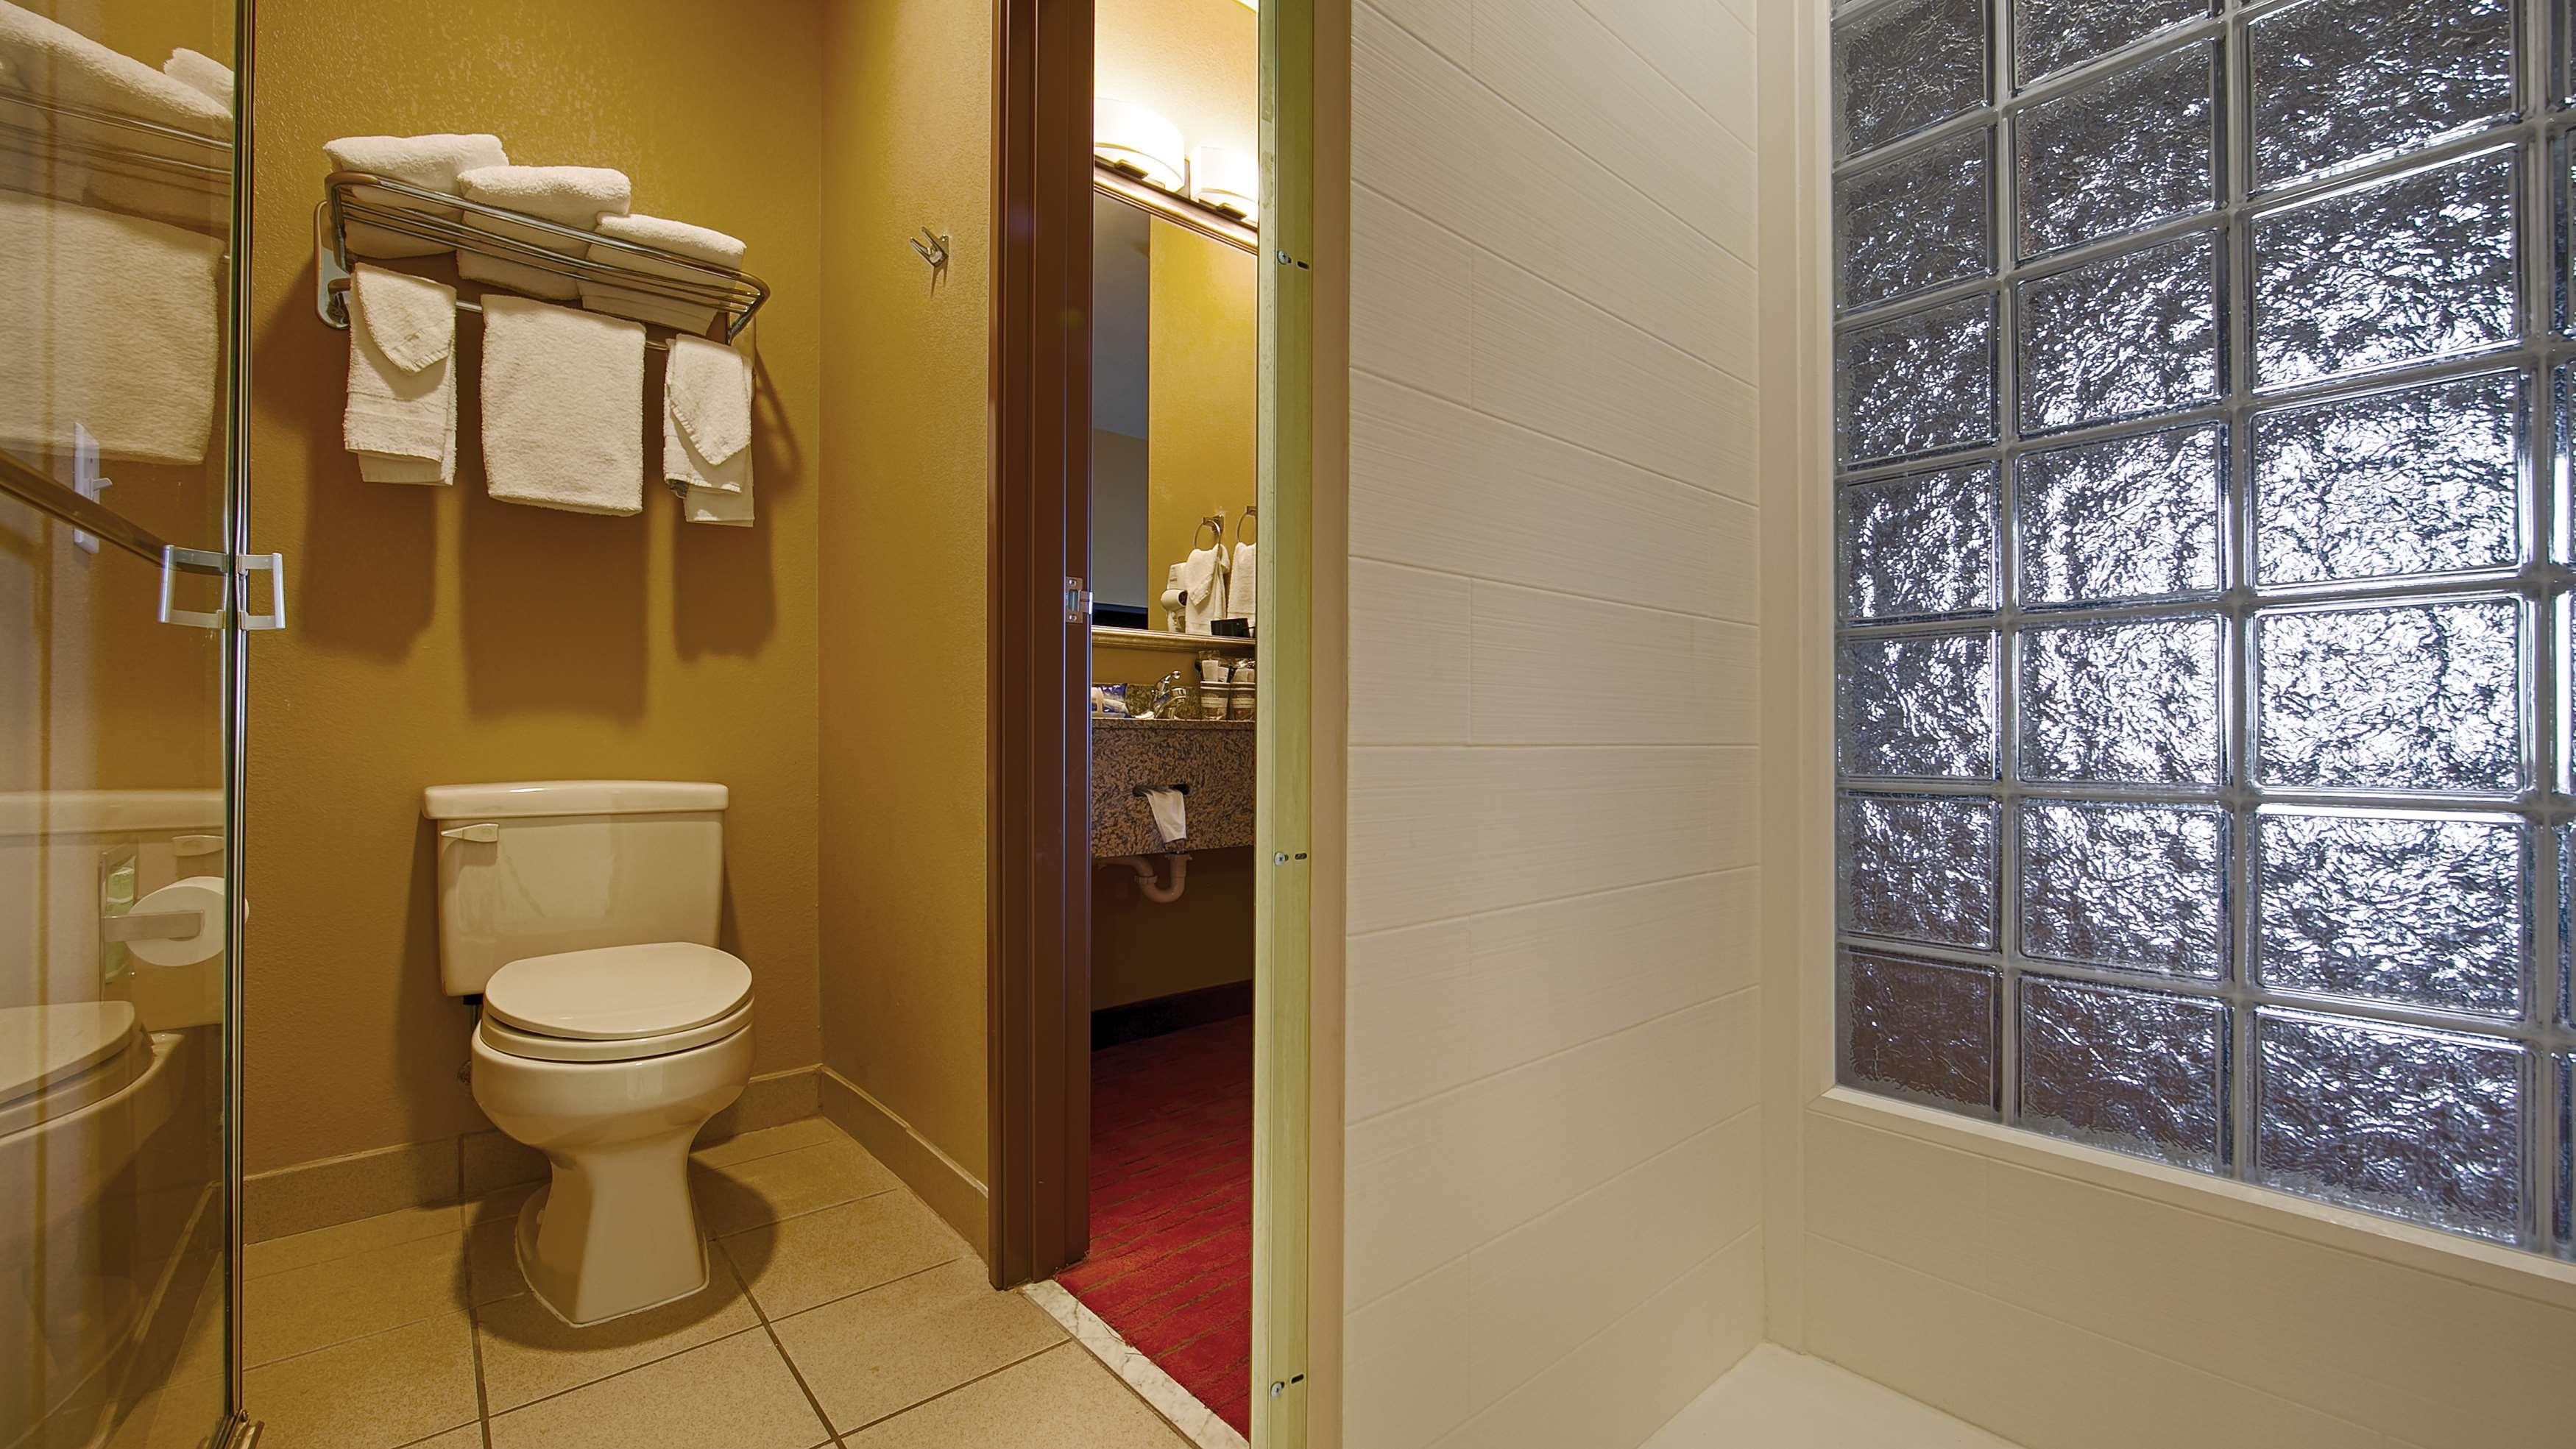 Best Western Plus Woodland Hills Hotel & Suites image 25